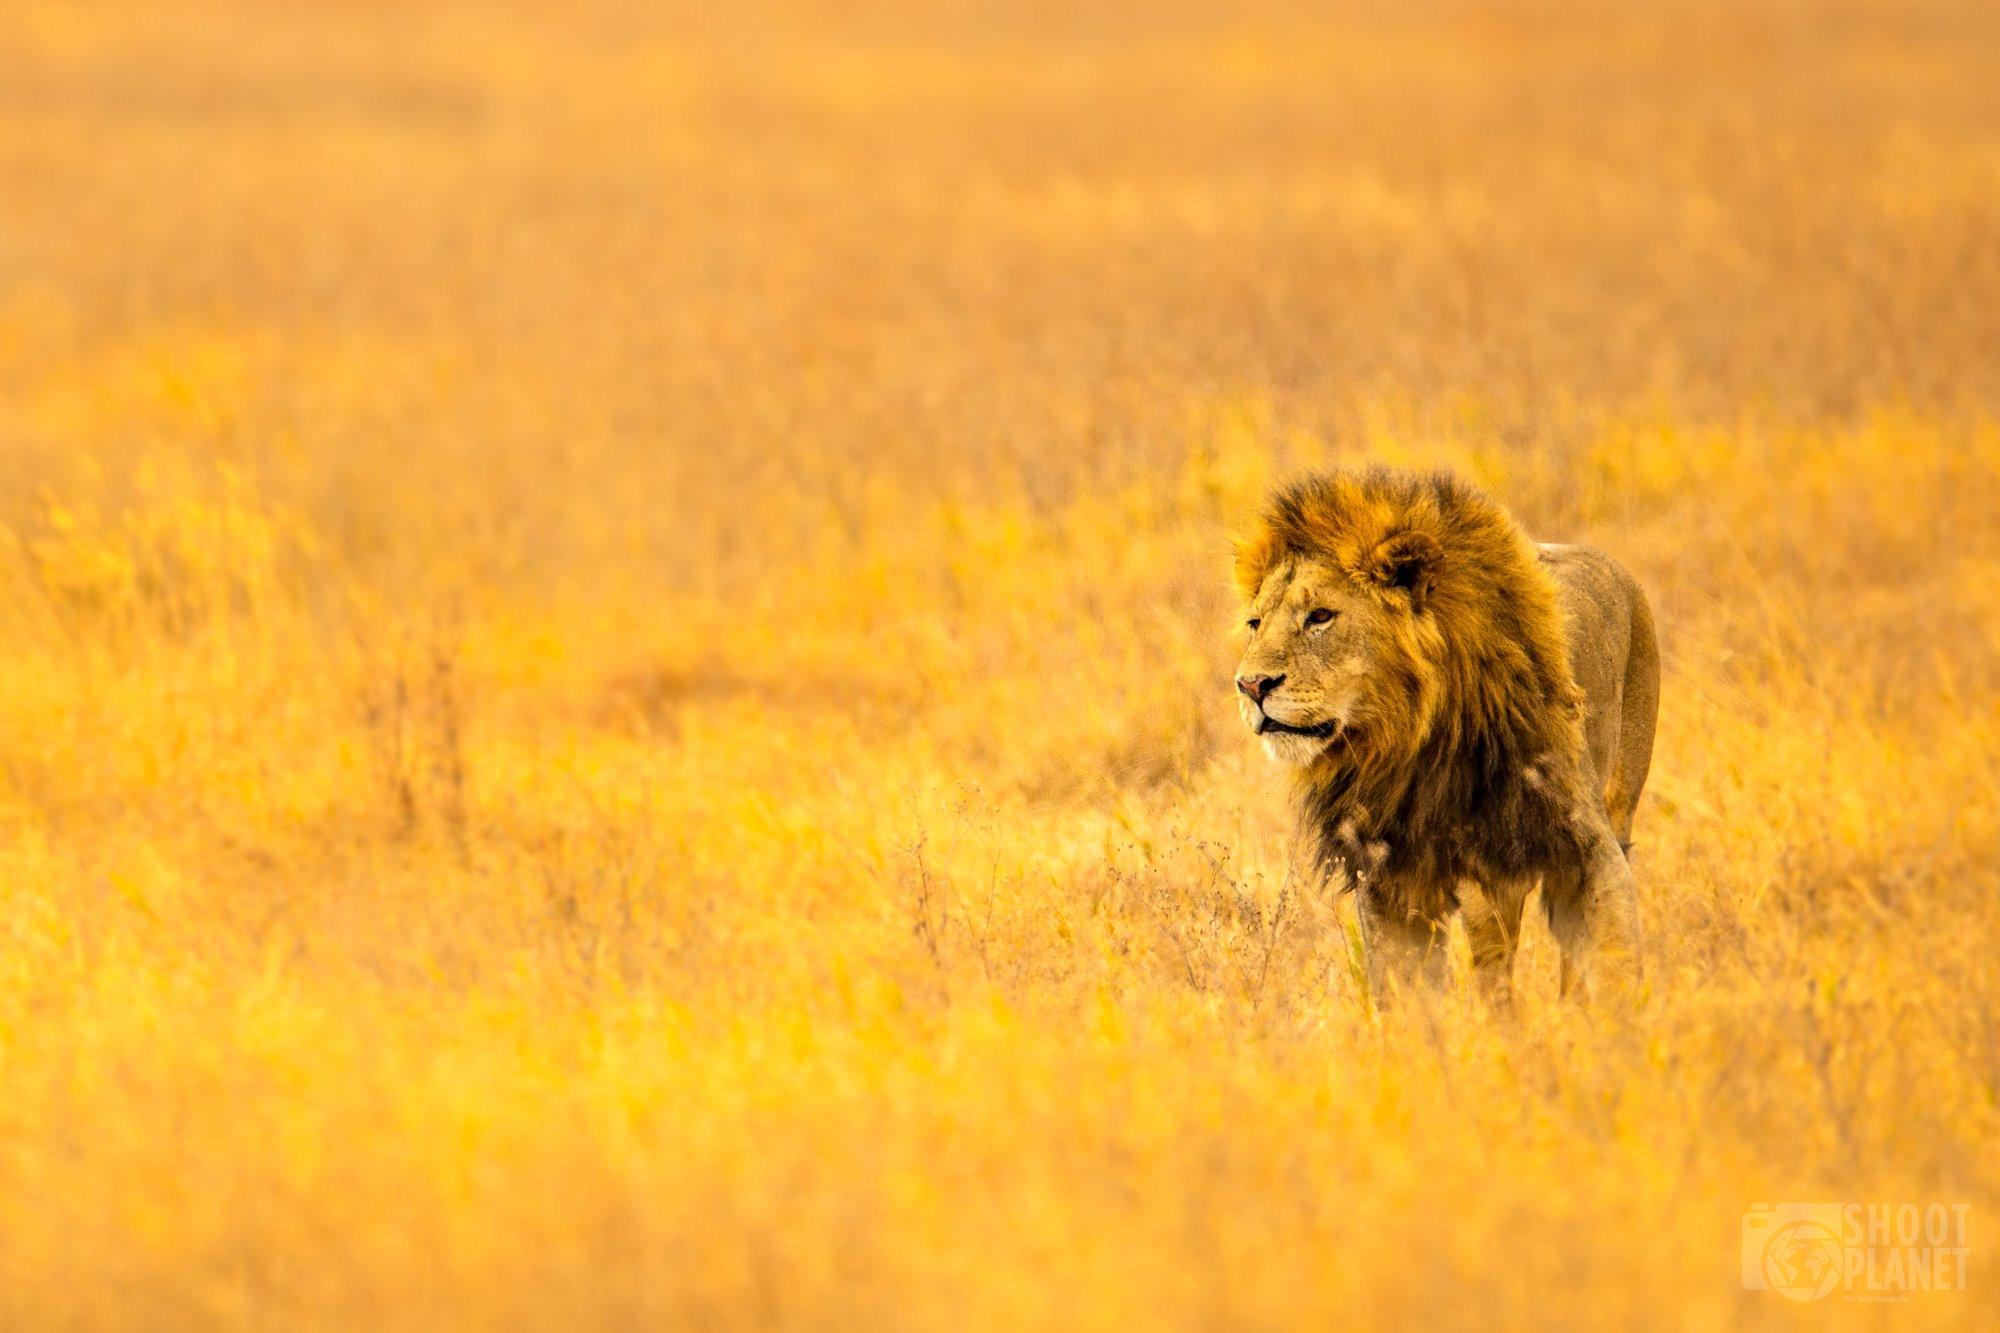 Lion hunting in Ngorongoro caldera, Tanzania Africa